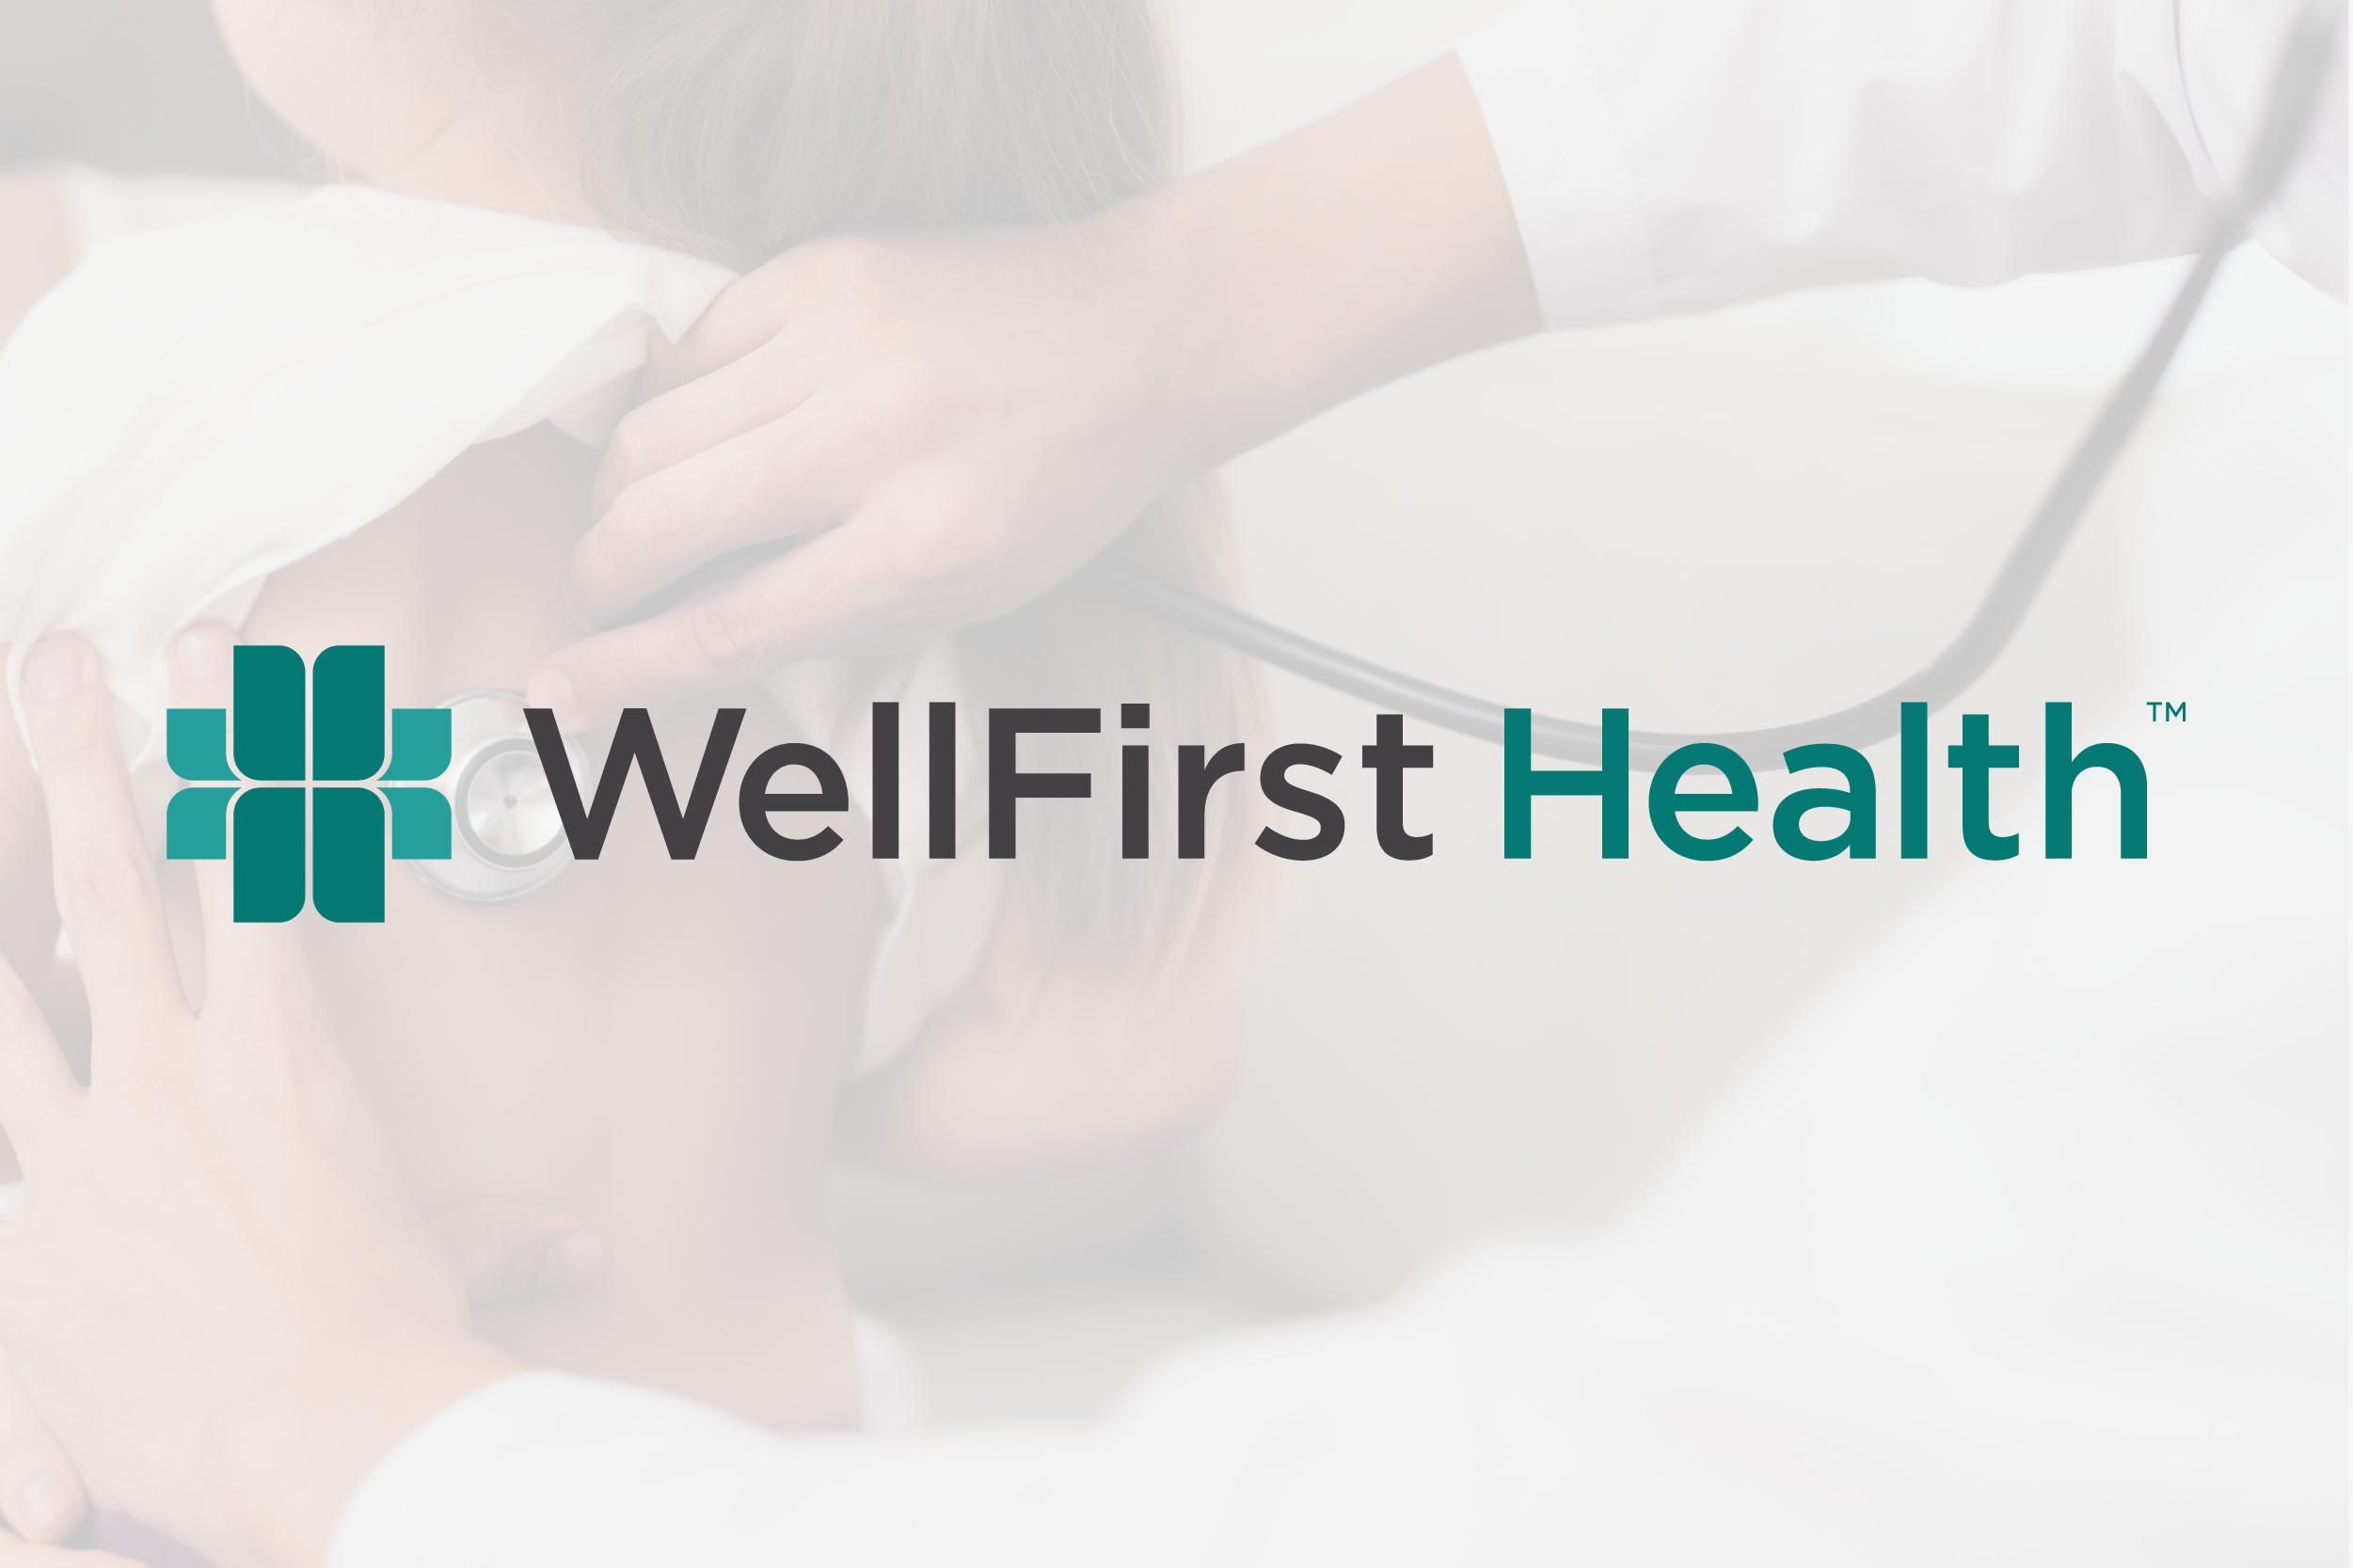 WellFirst Health Branding